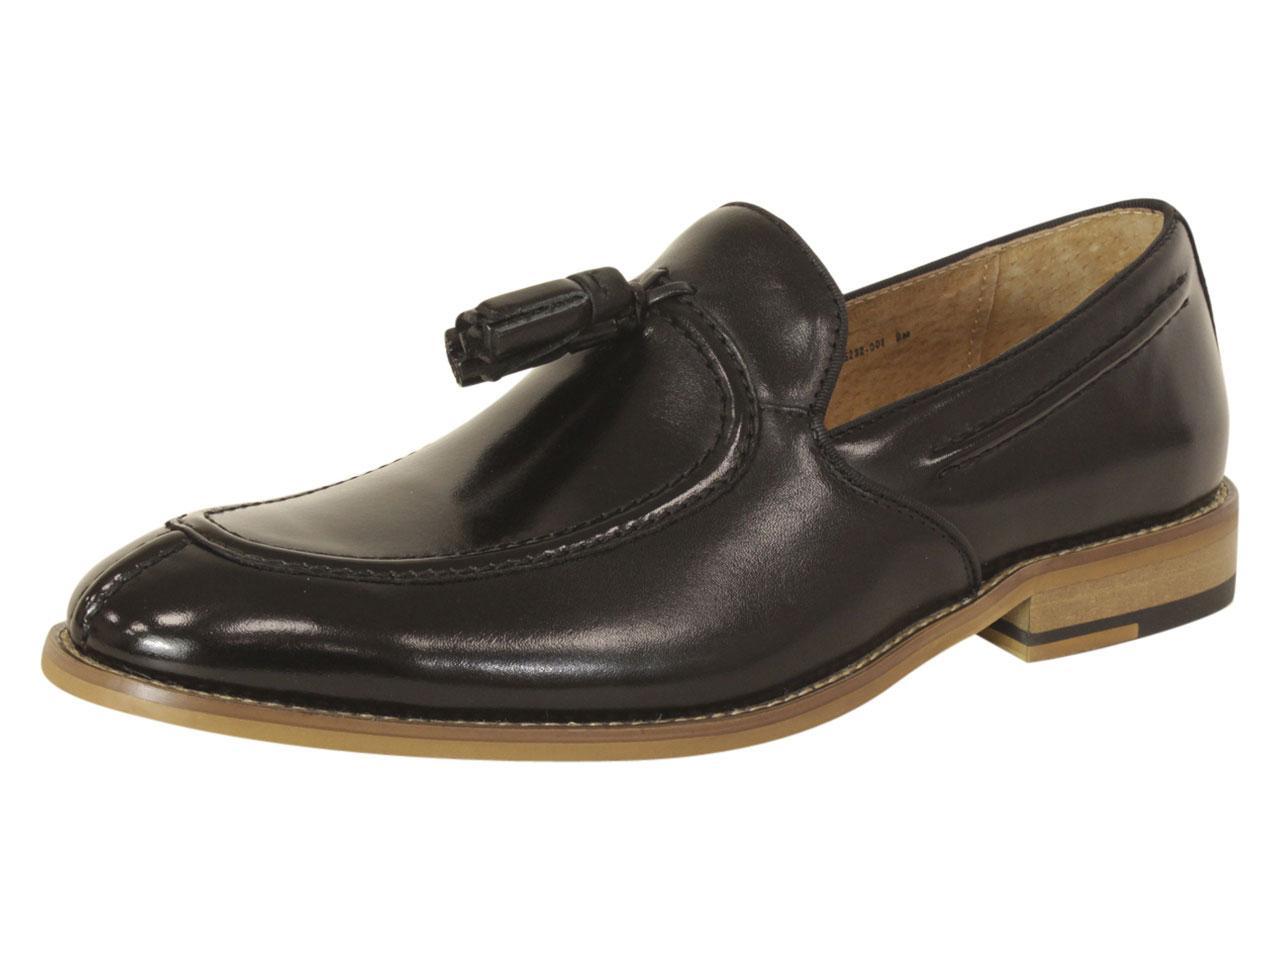 Donovan Memory Foam Loafers Shoes